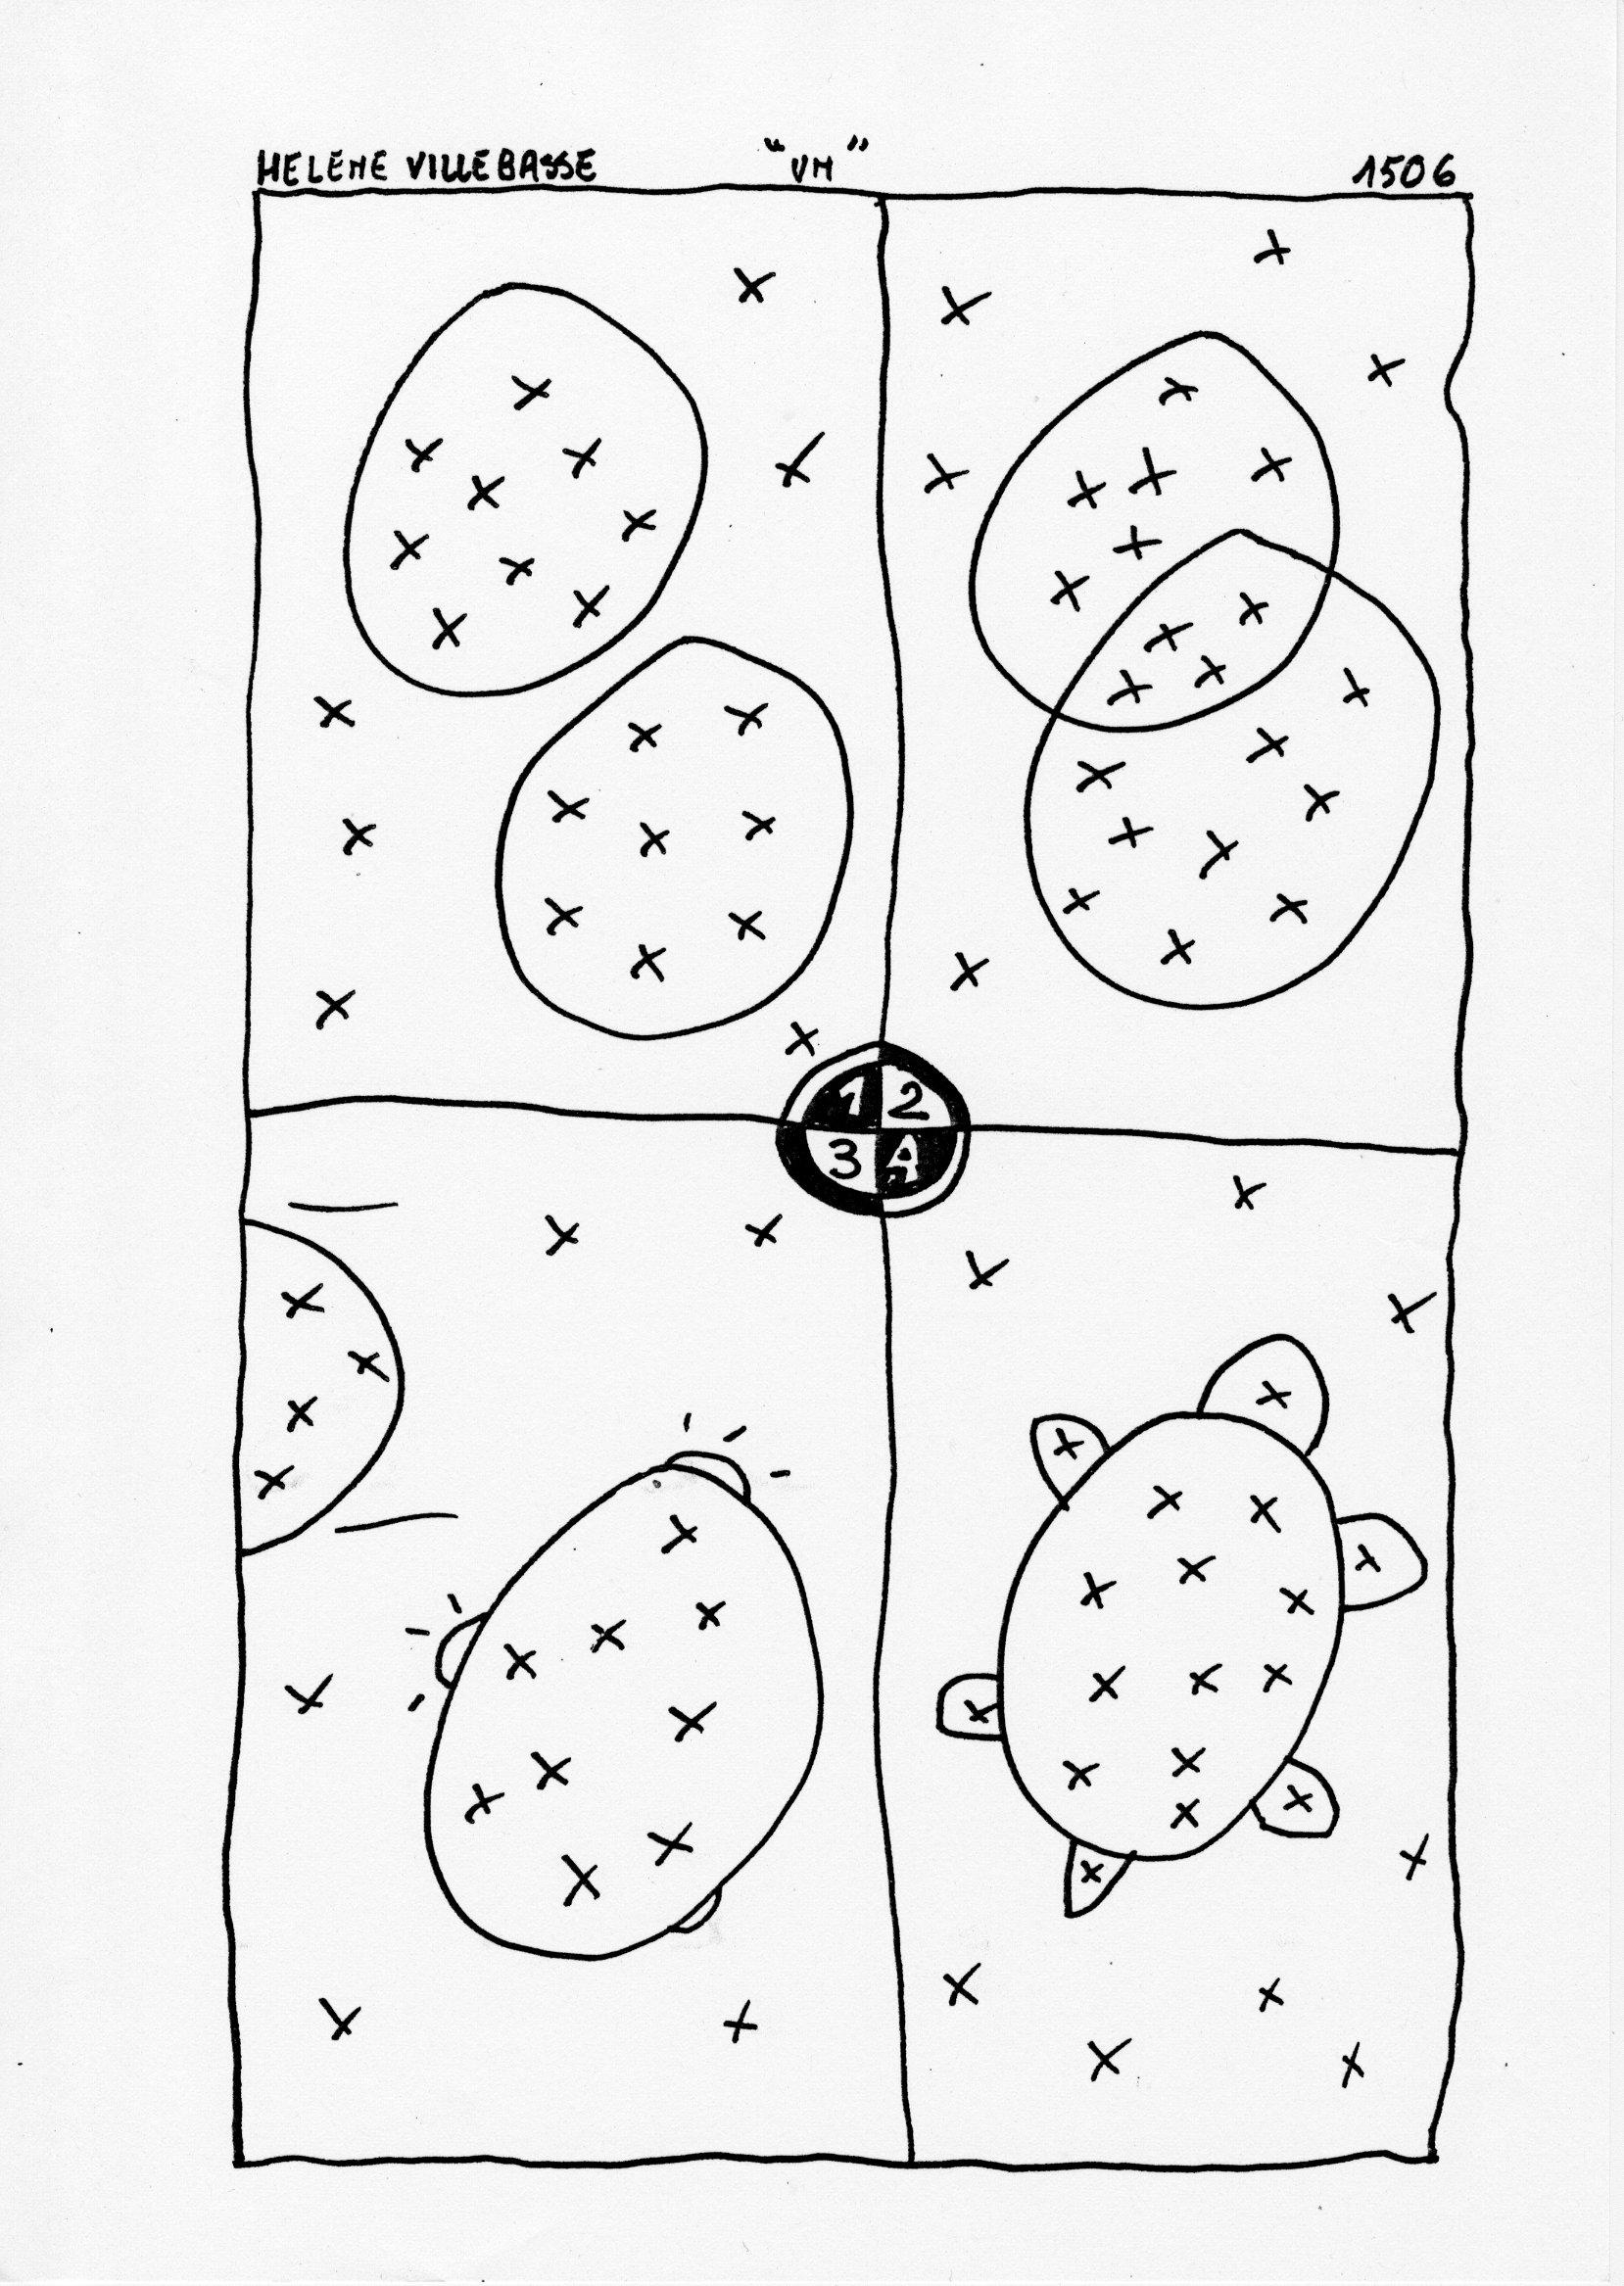 page 1506 H. Villebasse UN